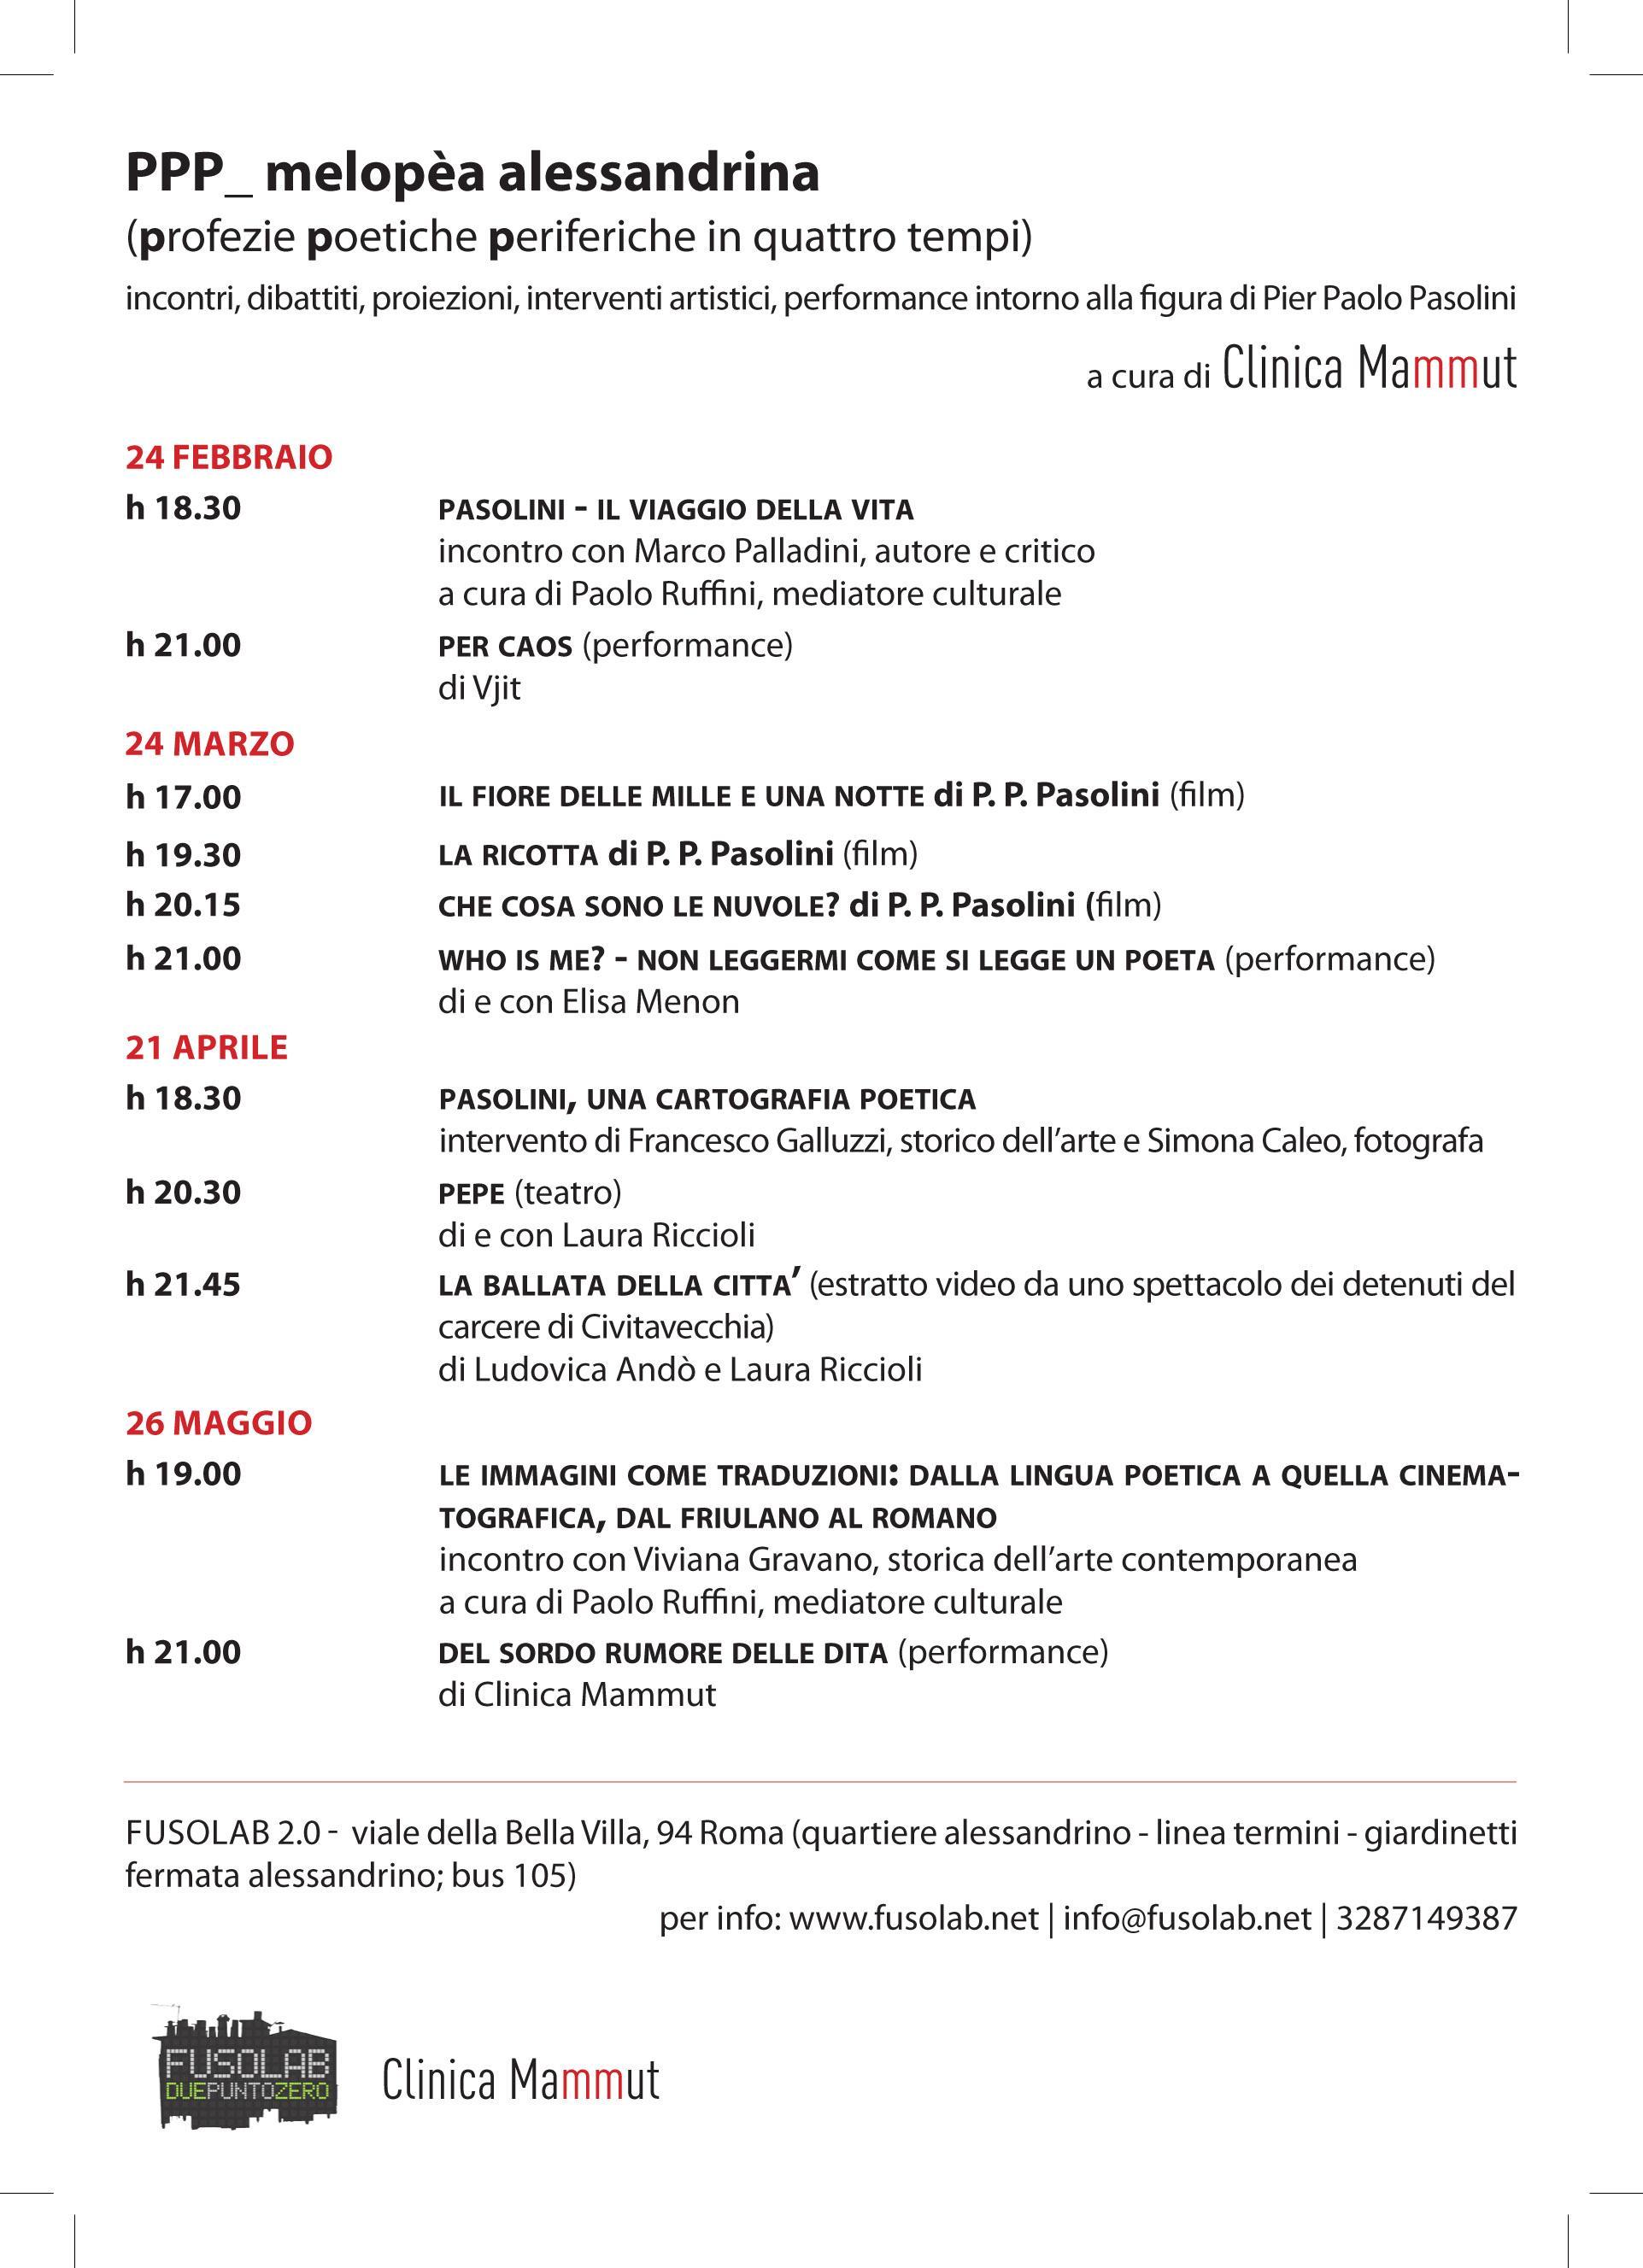 20130224 teatrointerno